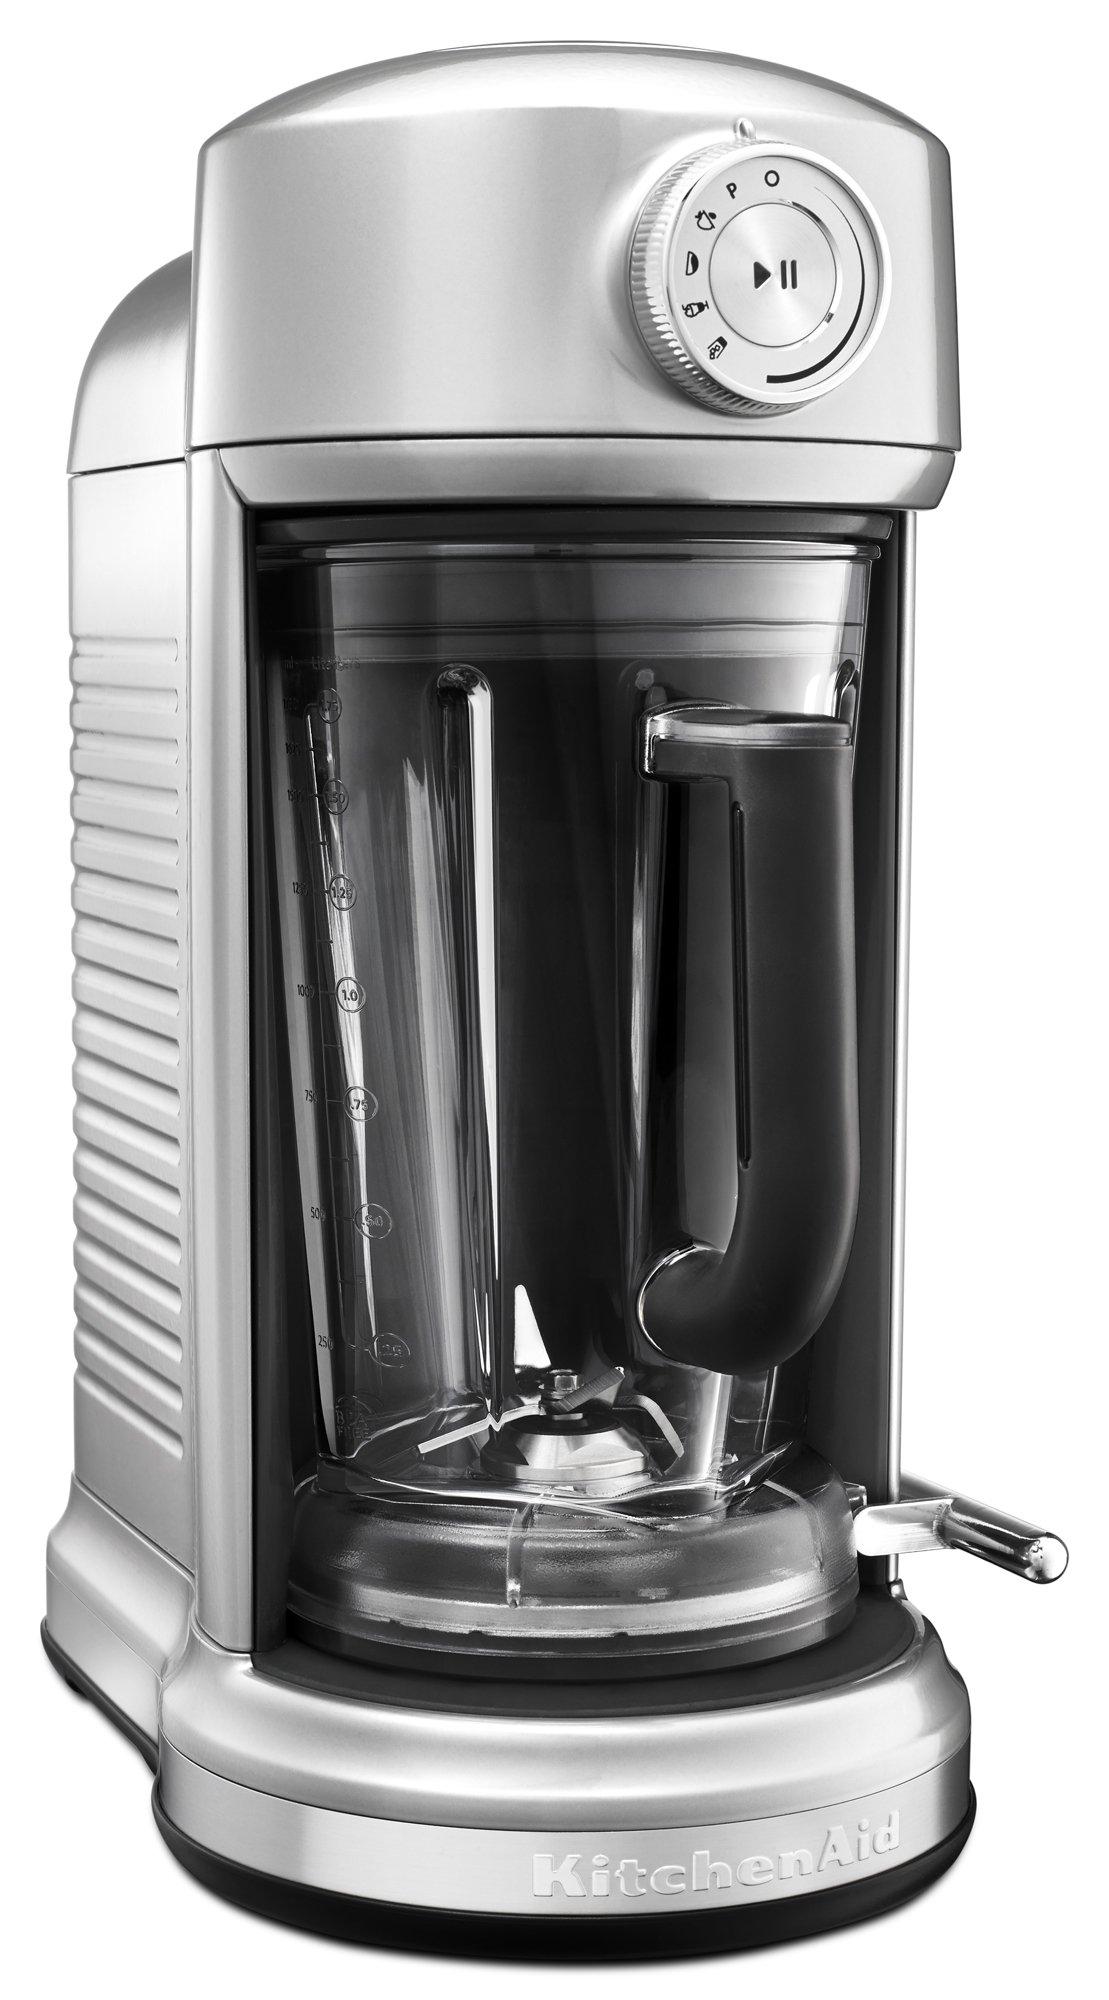 KitchenAid KSB5010SR Torrent Magnetic Drive Blender, Sugar Pearl